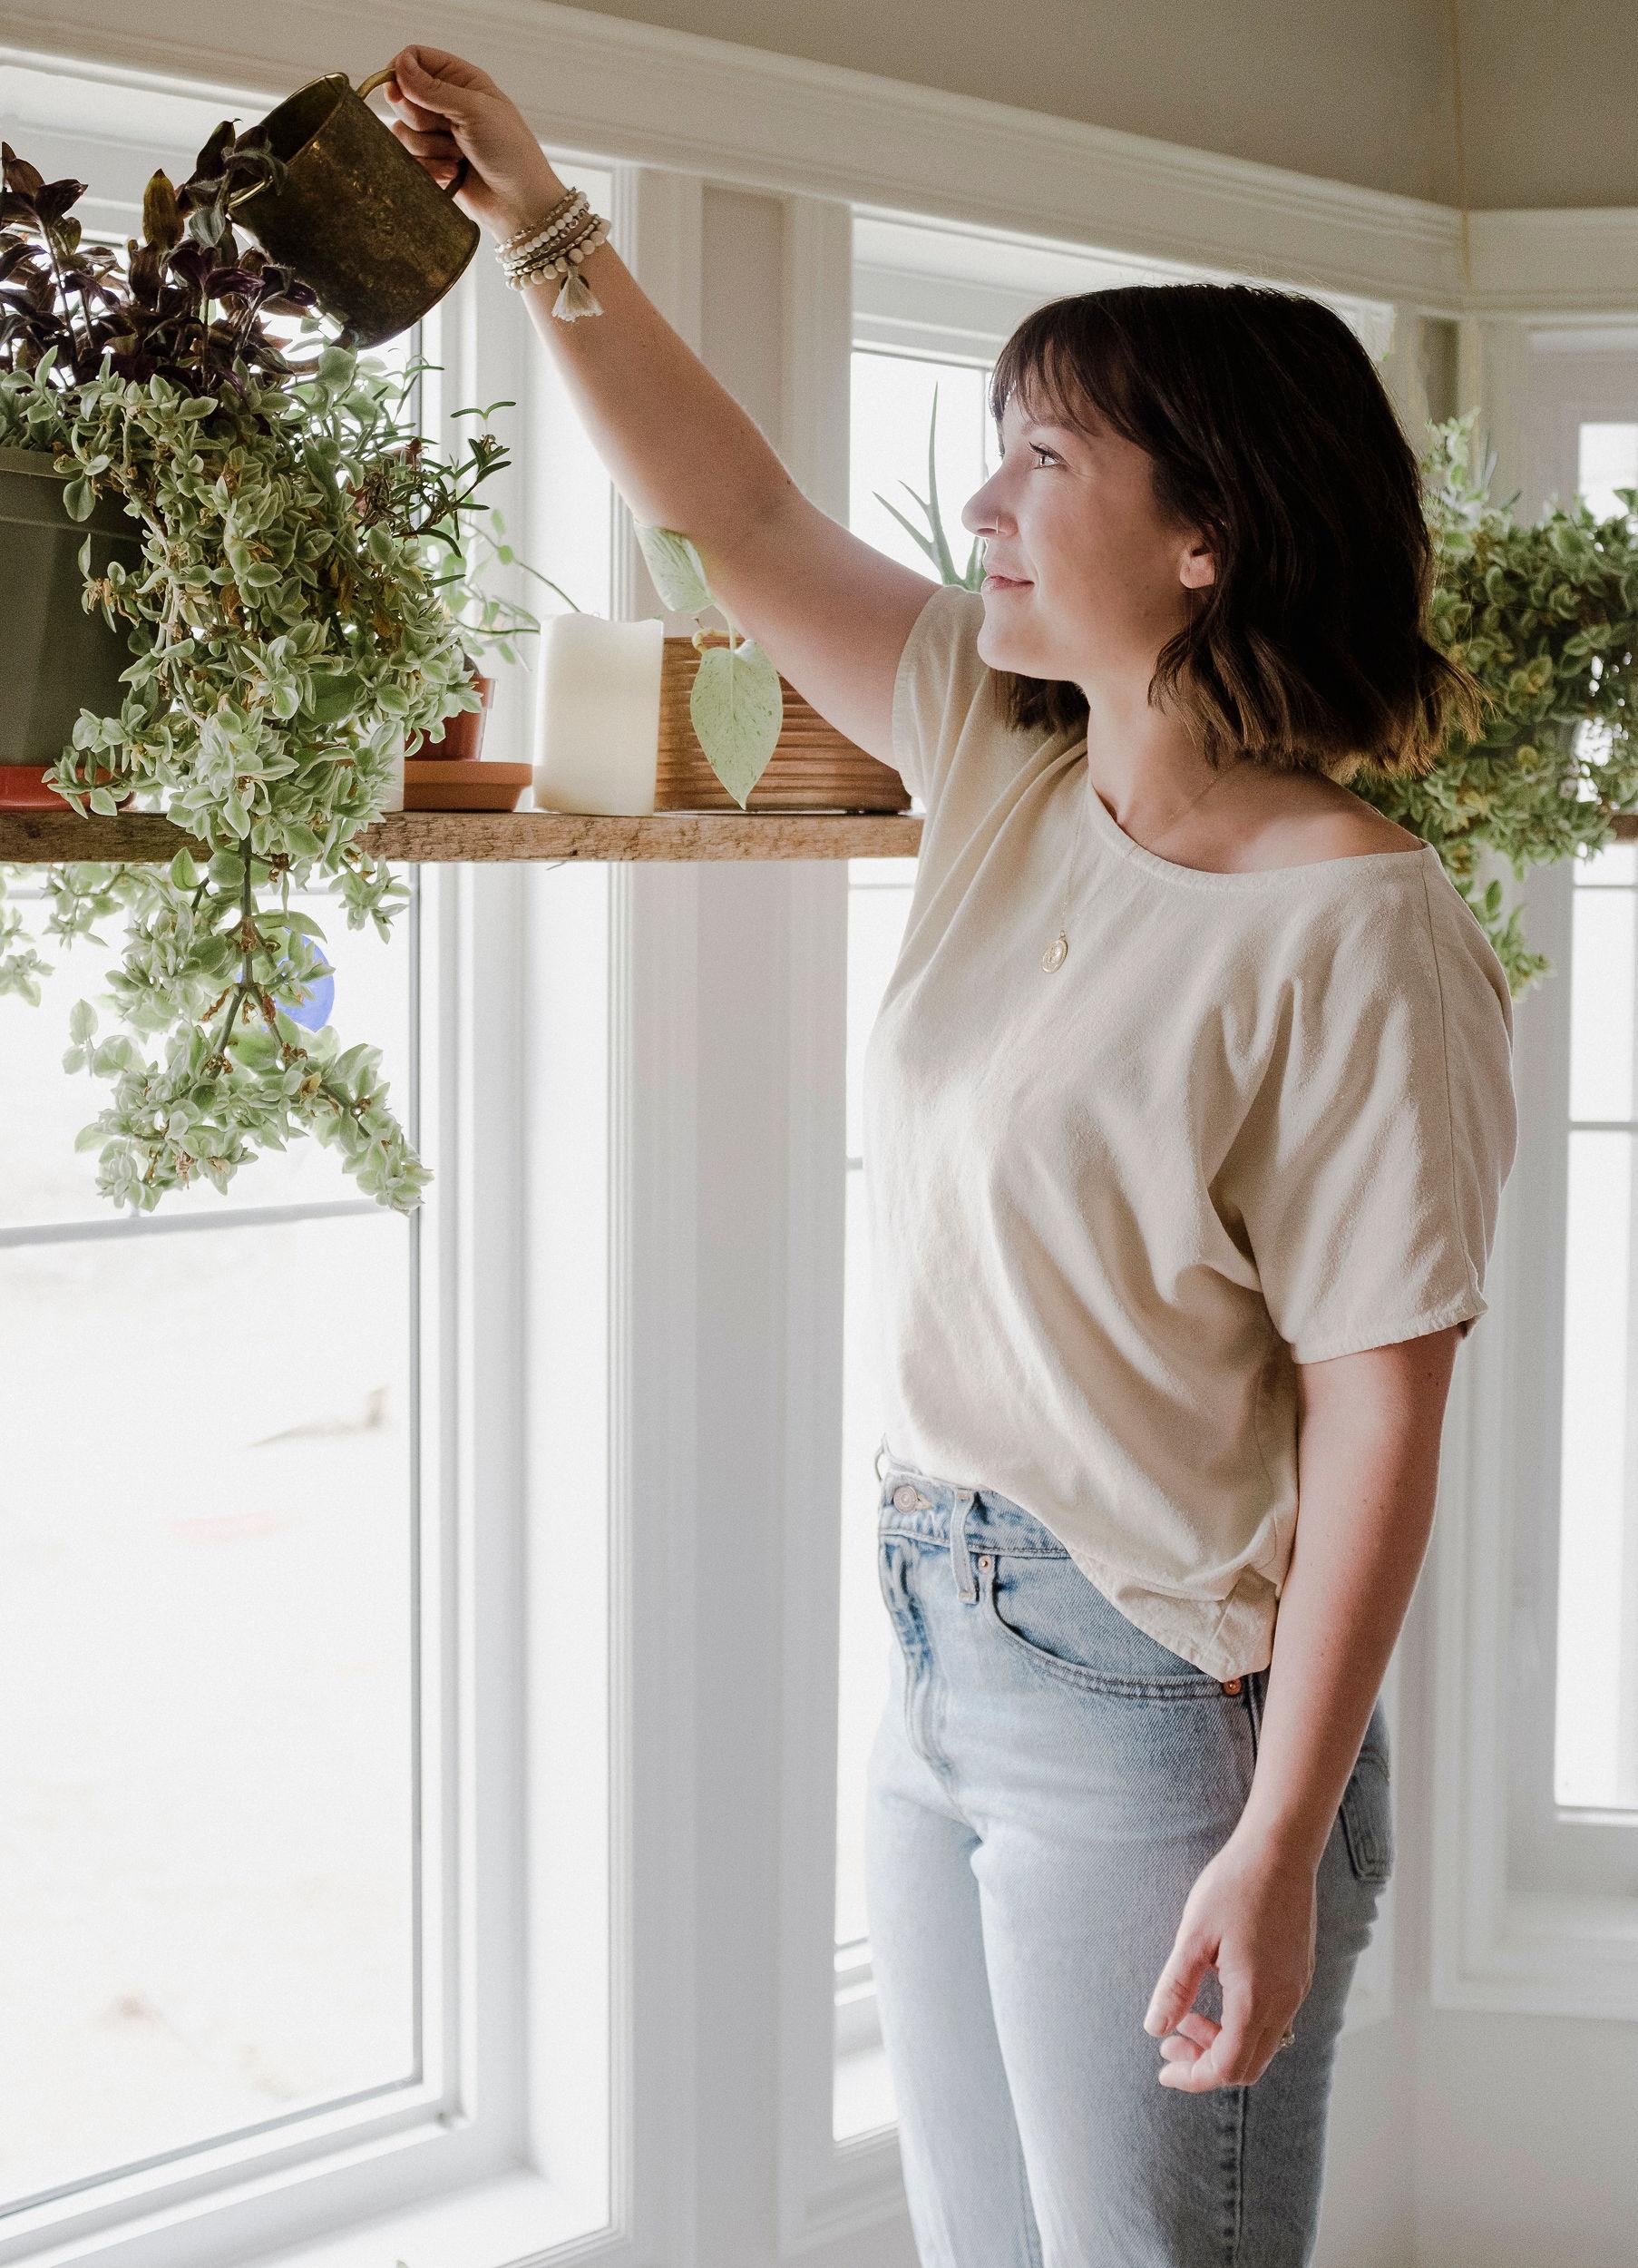 Karmen waters her plants in  Volerra bracelet set  from the shop.